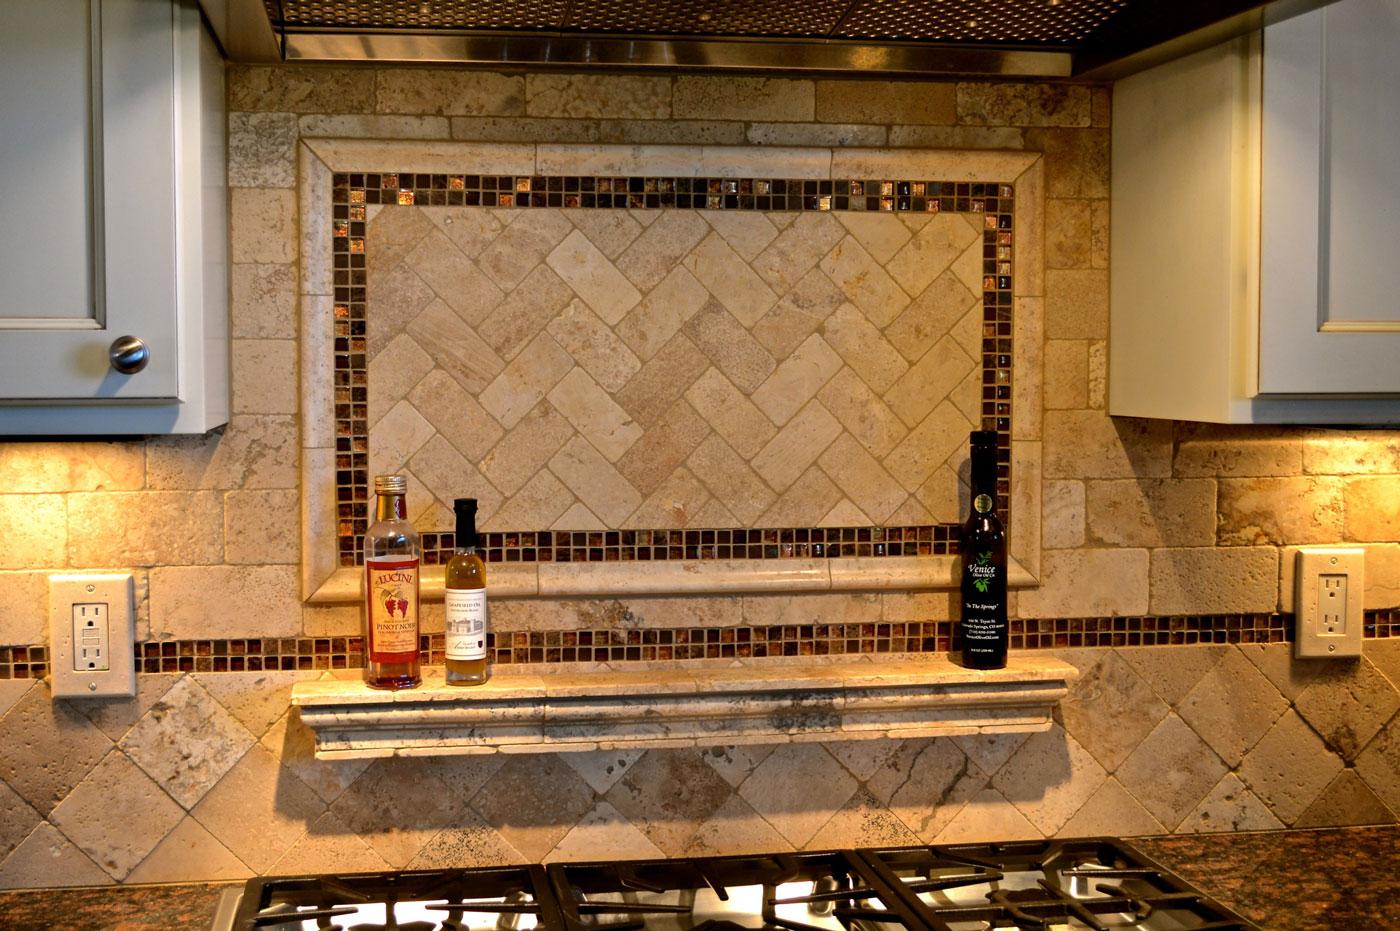 Superior Colorado Springs Interior Design Custom Backsplasjh Tile Kitchen Nice Ideas